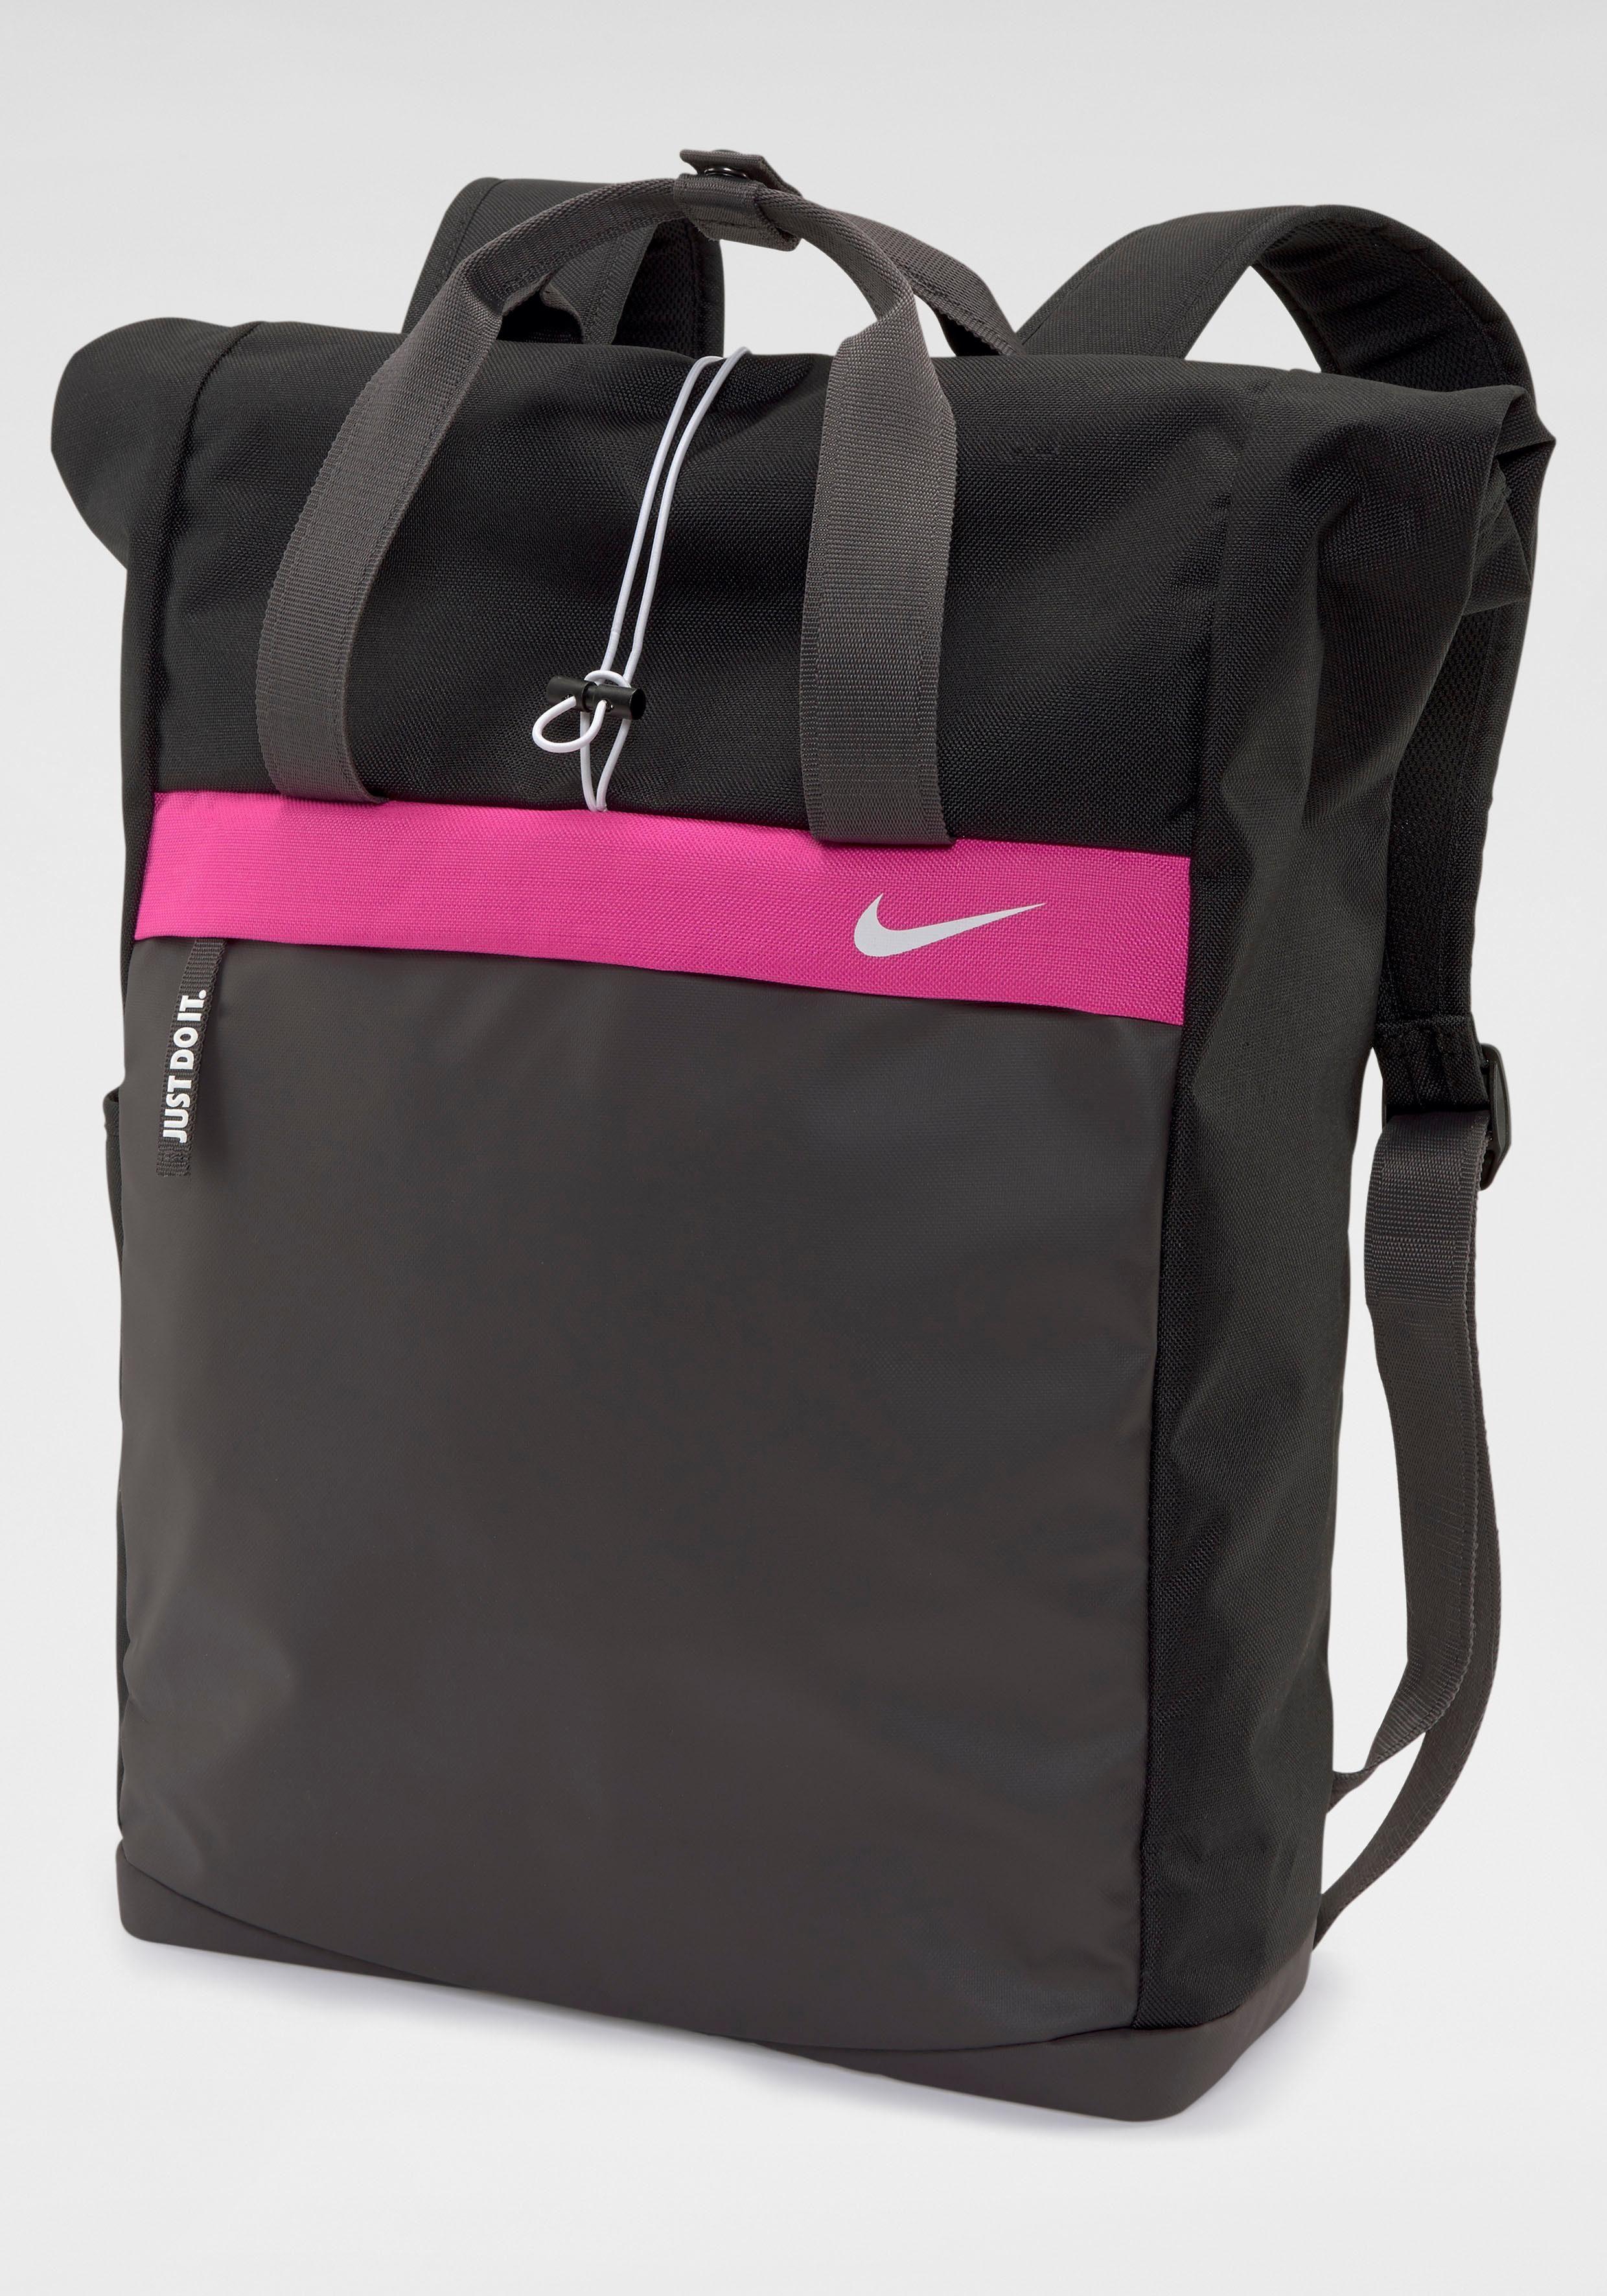 Nike Sportrucksack »NIKE RADIATE TRAININGSRUCKSACK« online kaufen | OTTO